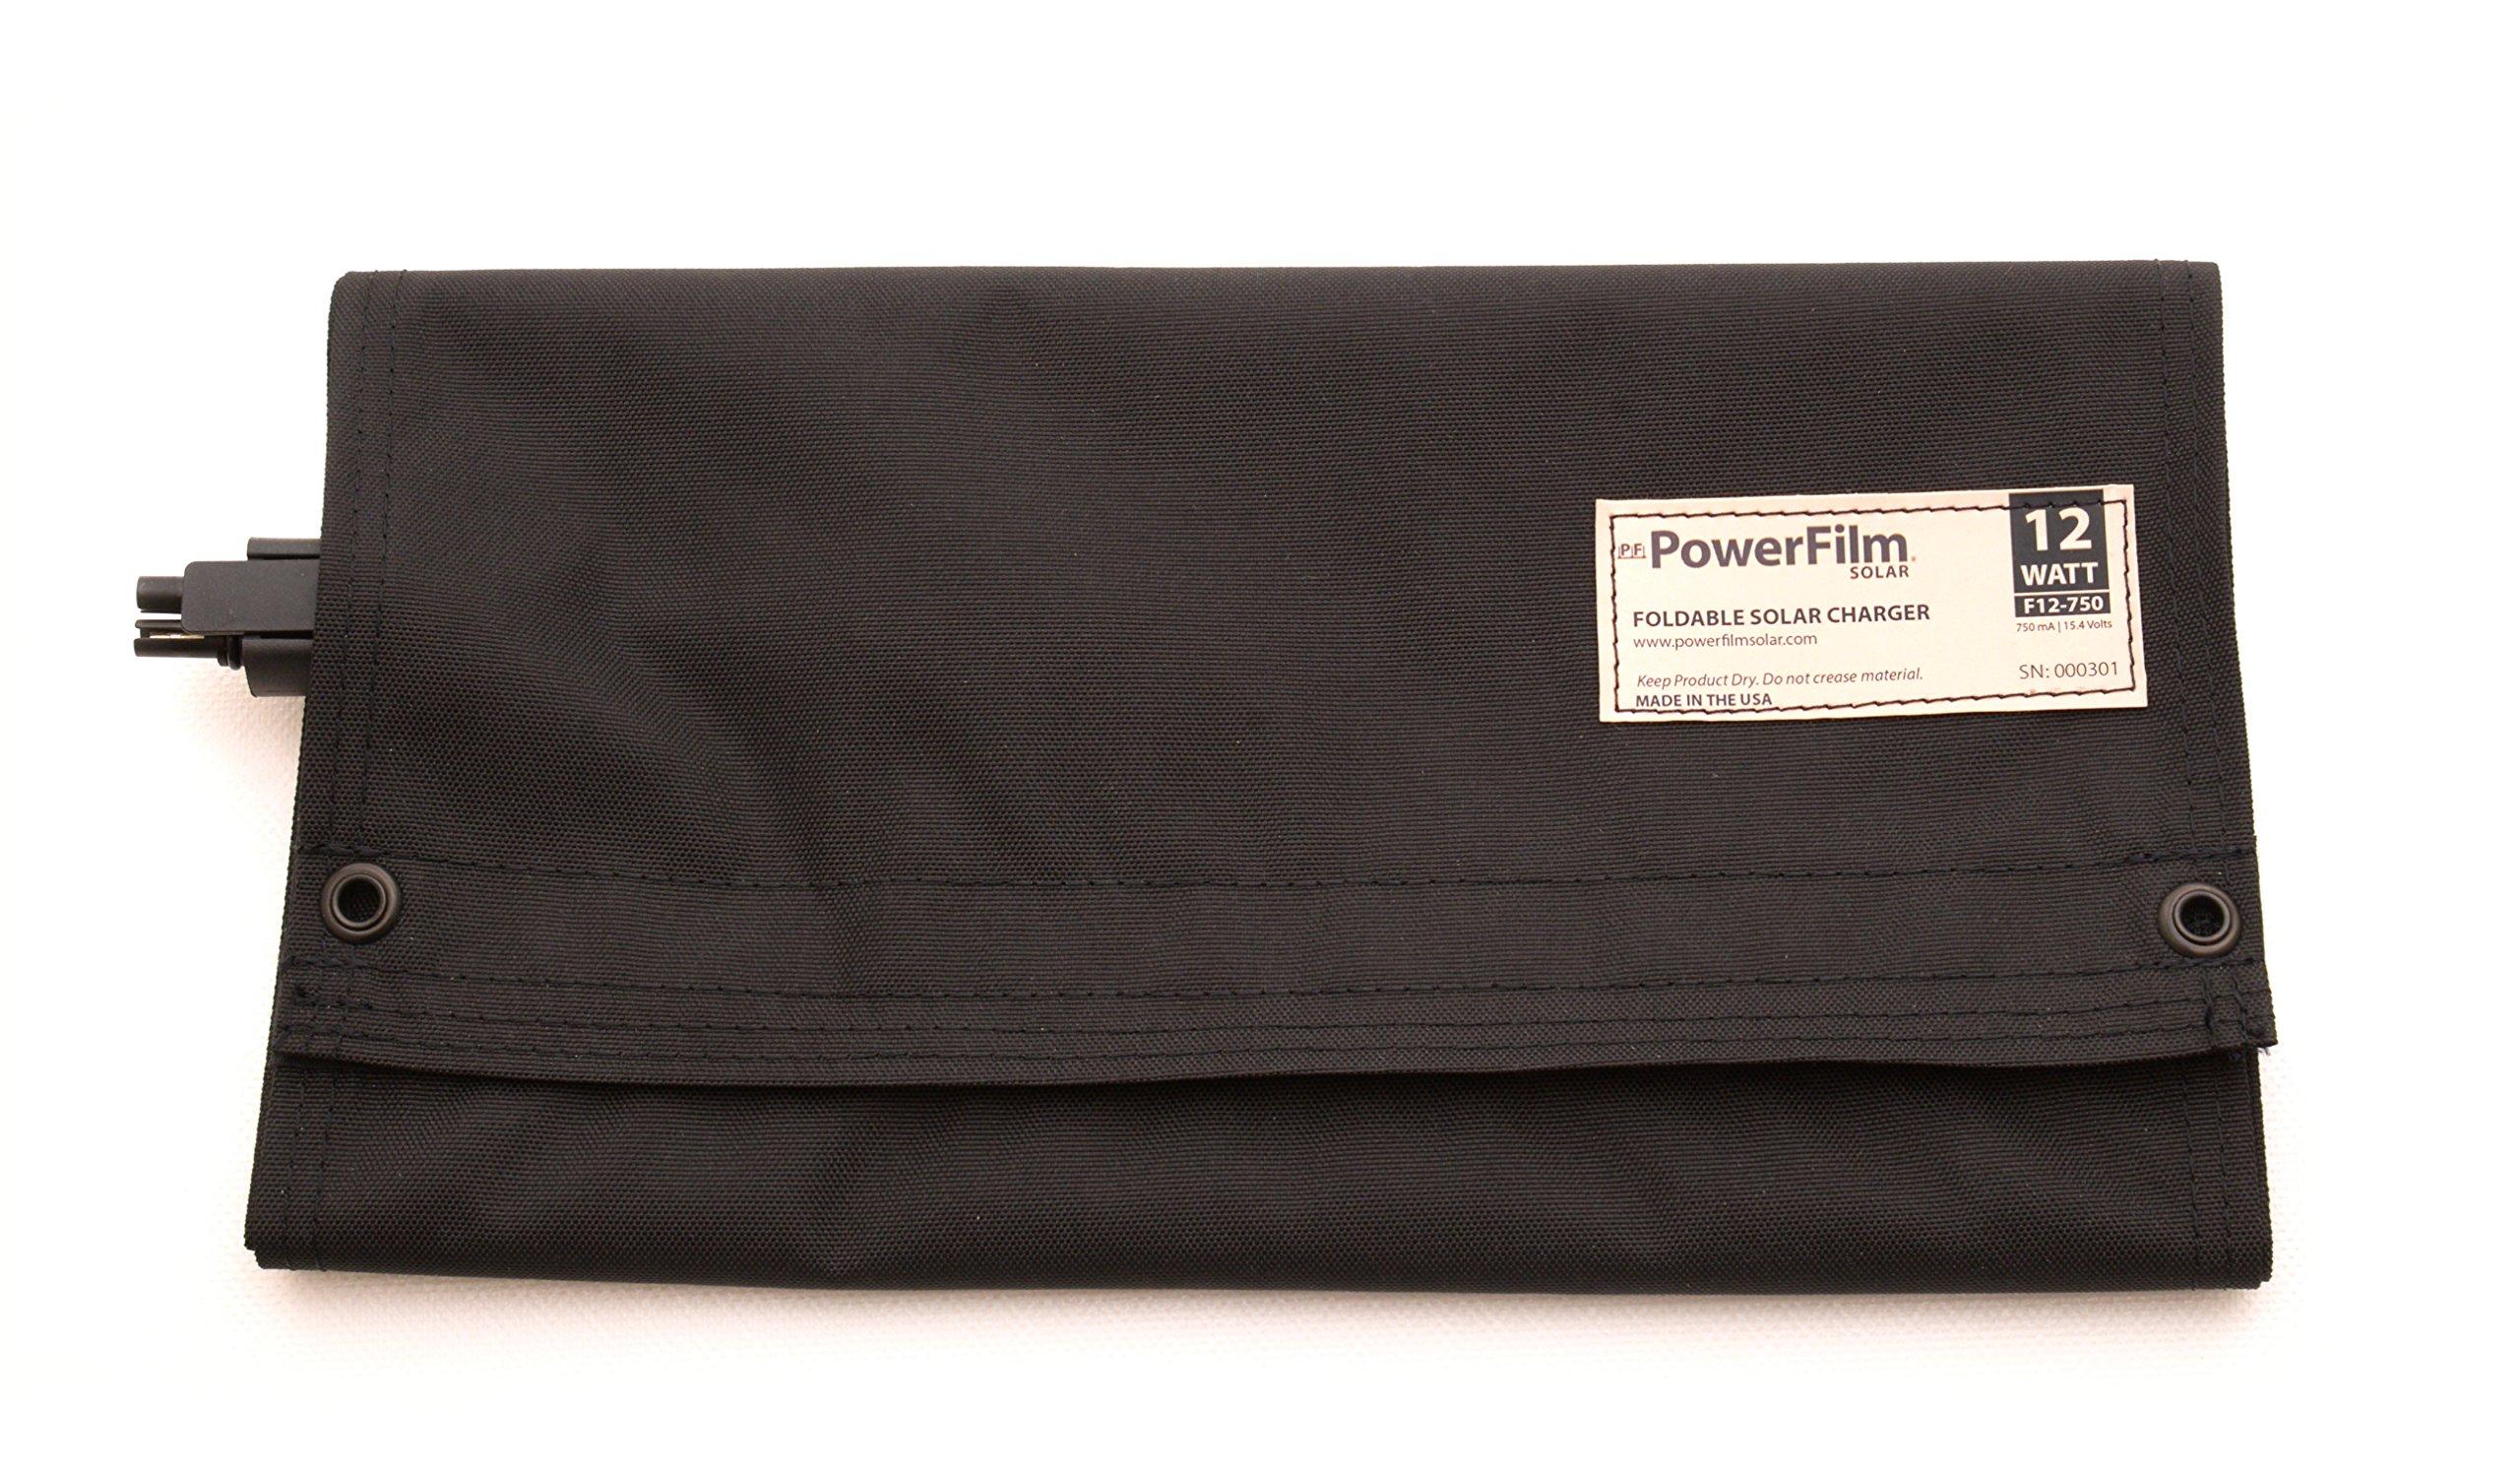 PF POWERFILM 12 Watt Foldable Solar Panel